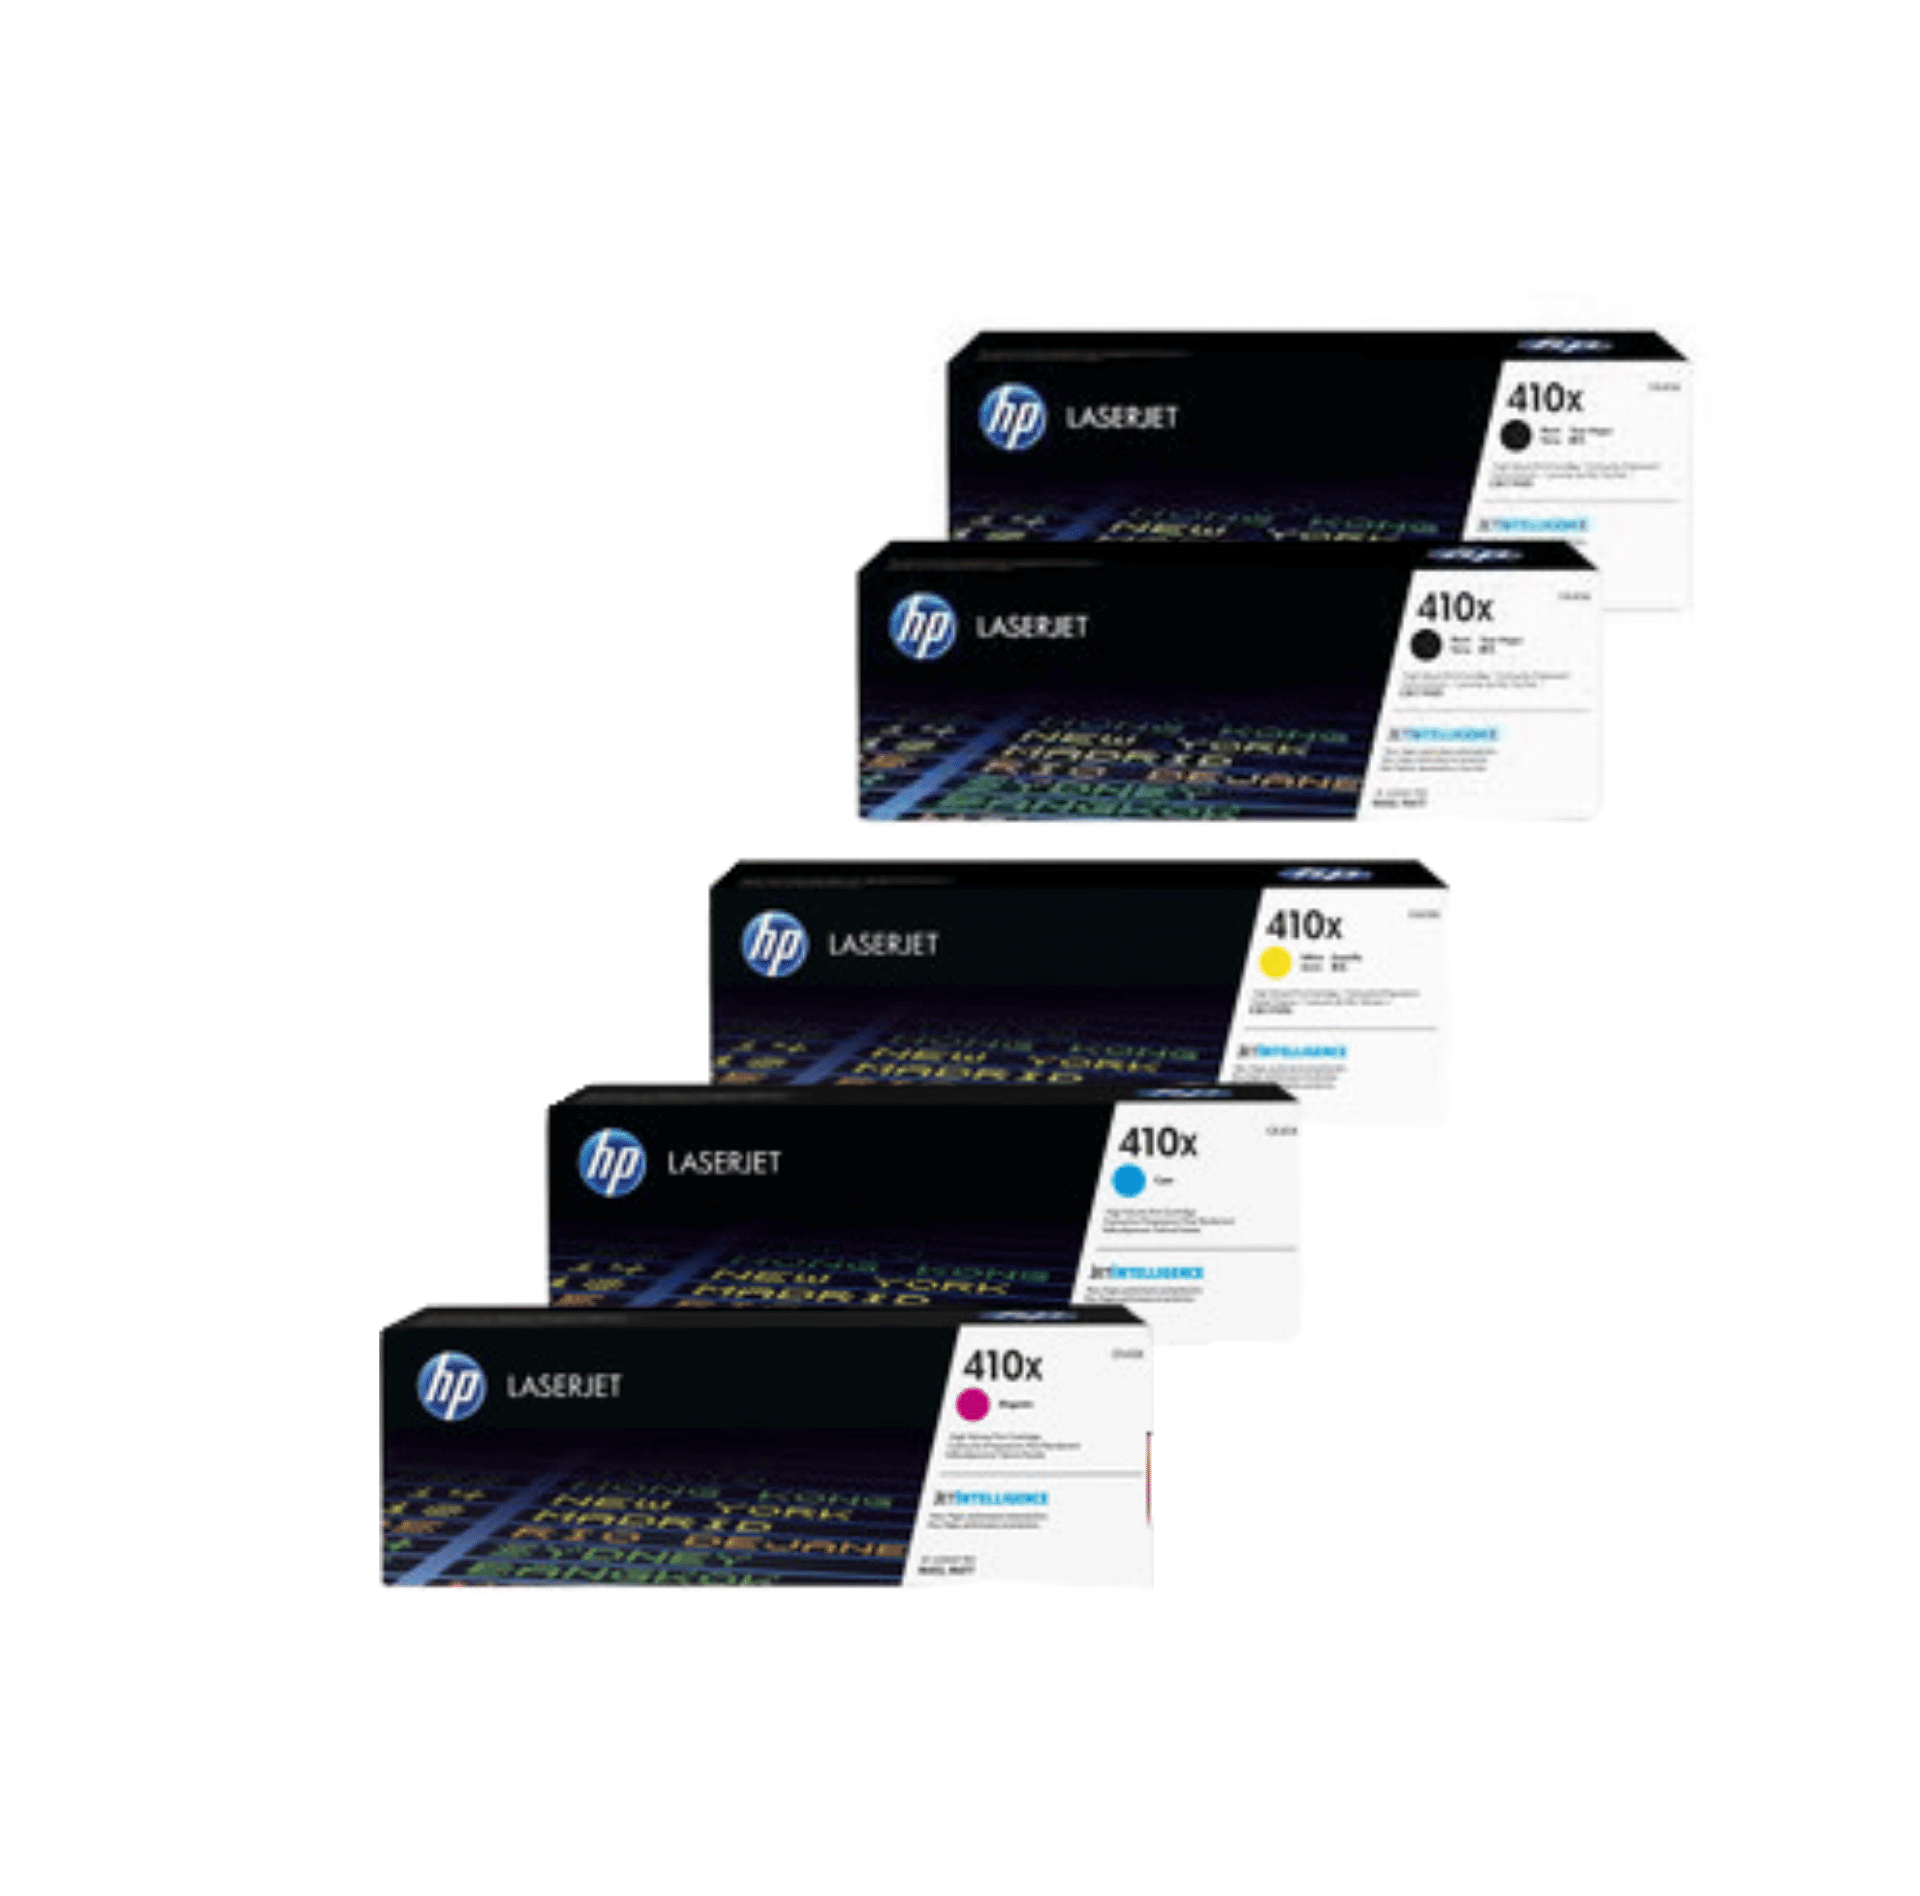 HP 410X Toner Cartridges Value Pack - Includes: [2 x Black, 1 x Cyan, Magenta, Yellow]